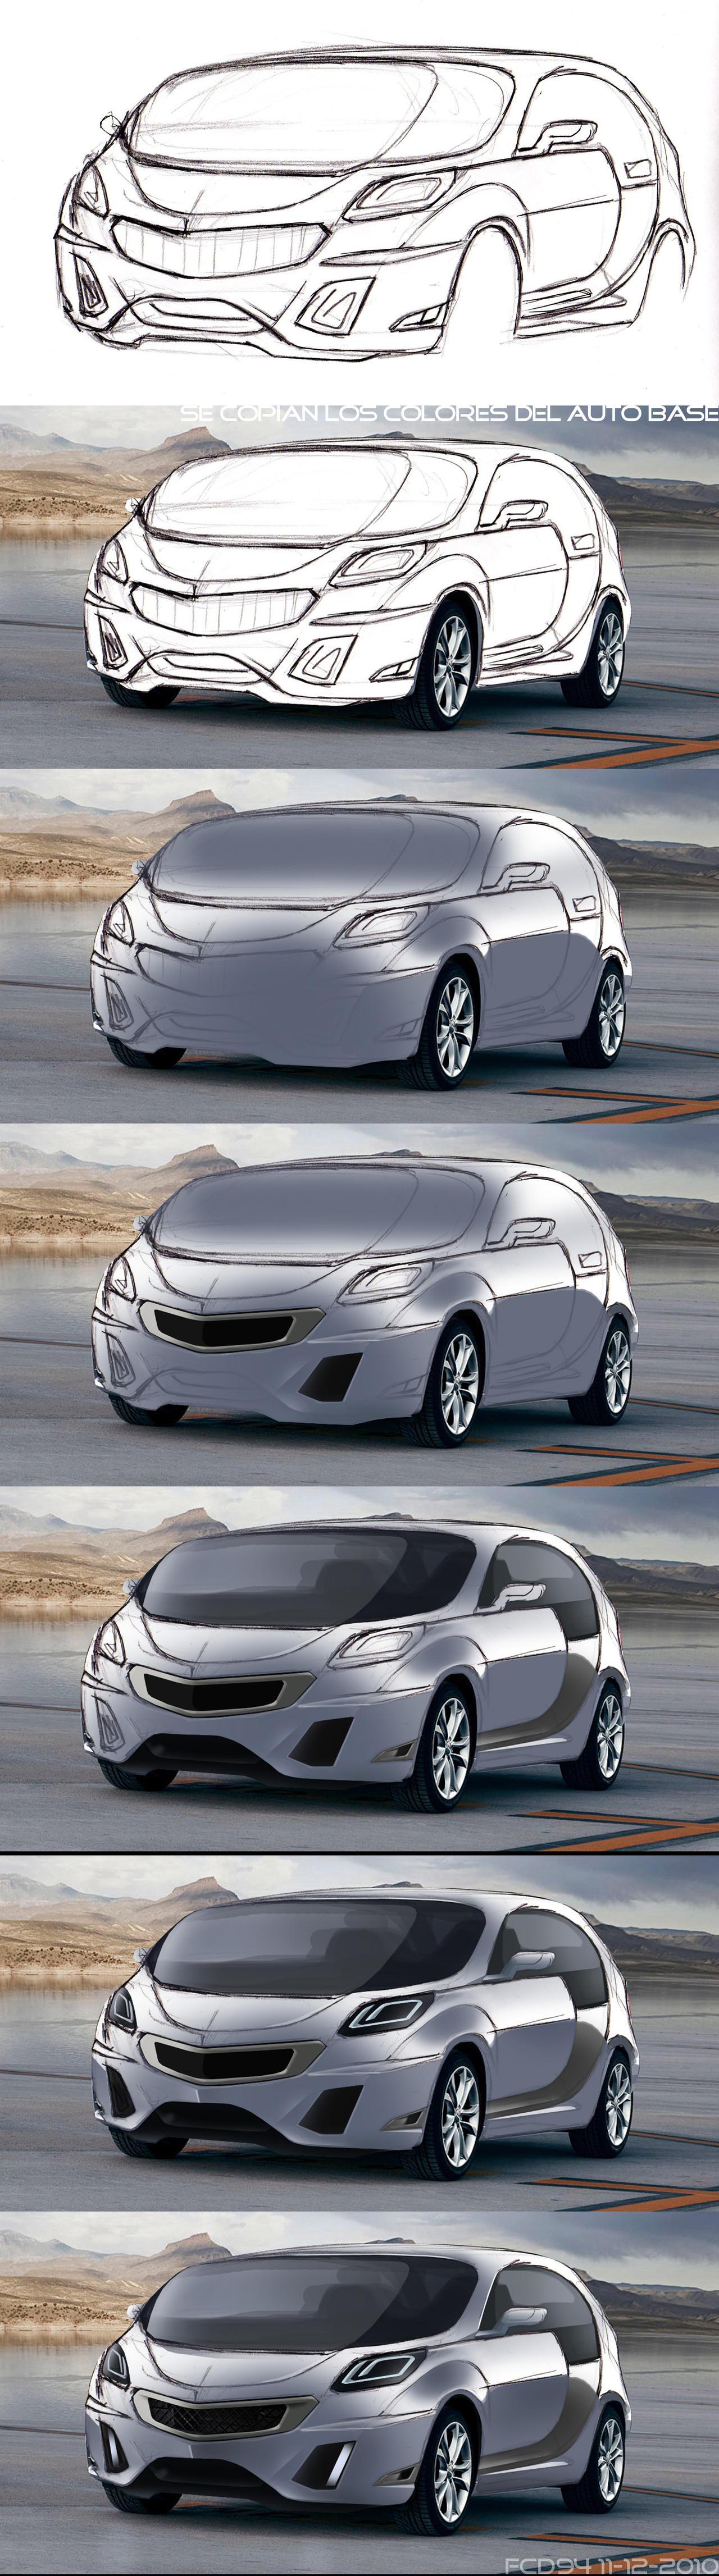 diseño de autos